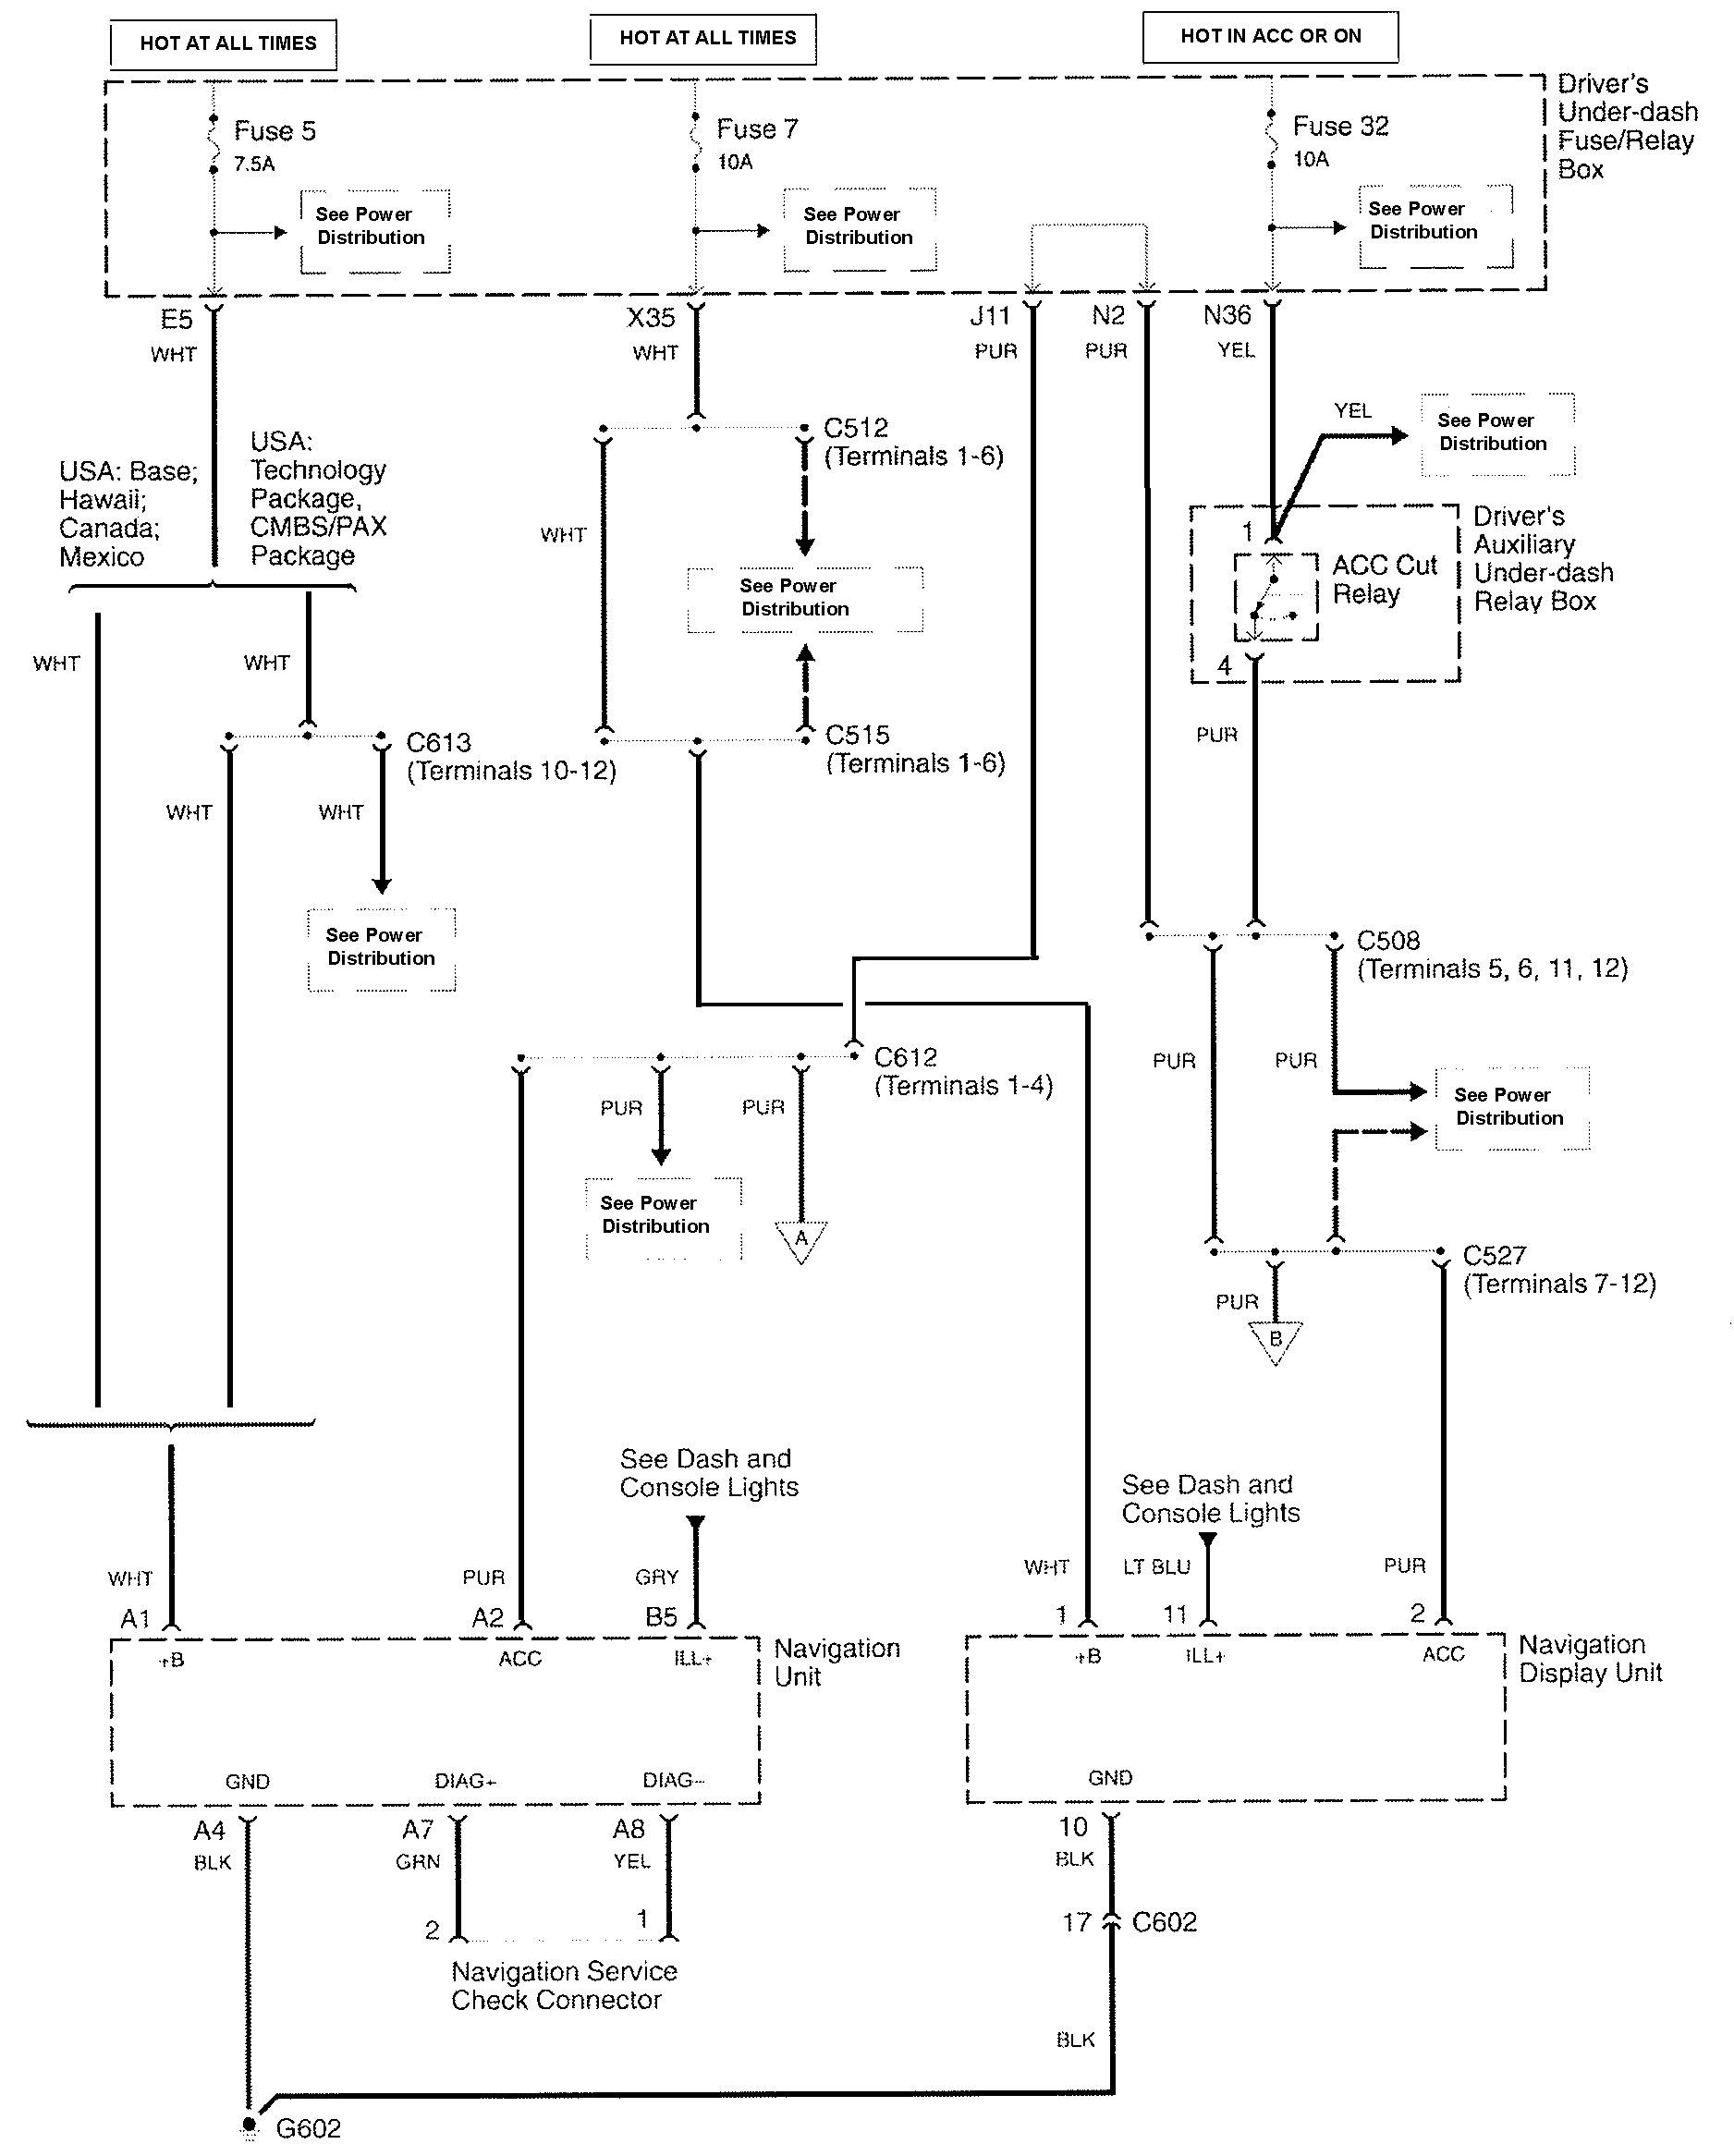 Acura Navigation Wiring Diagram : Acura rl wiring diagrams navigation system